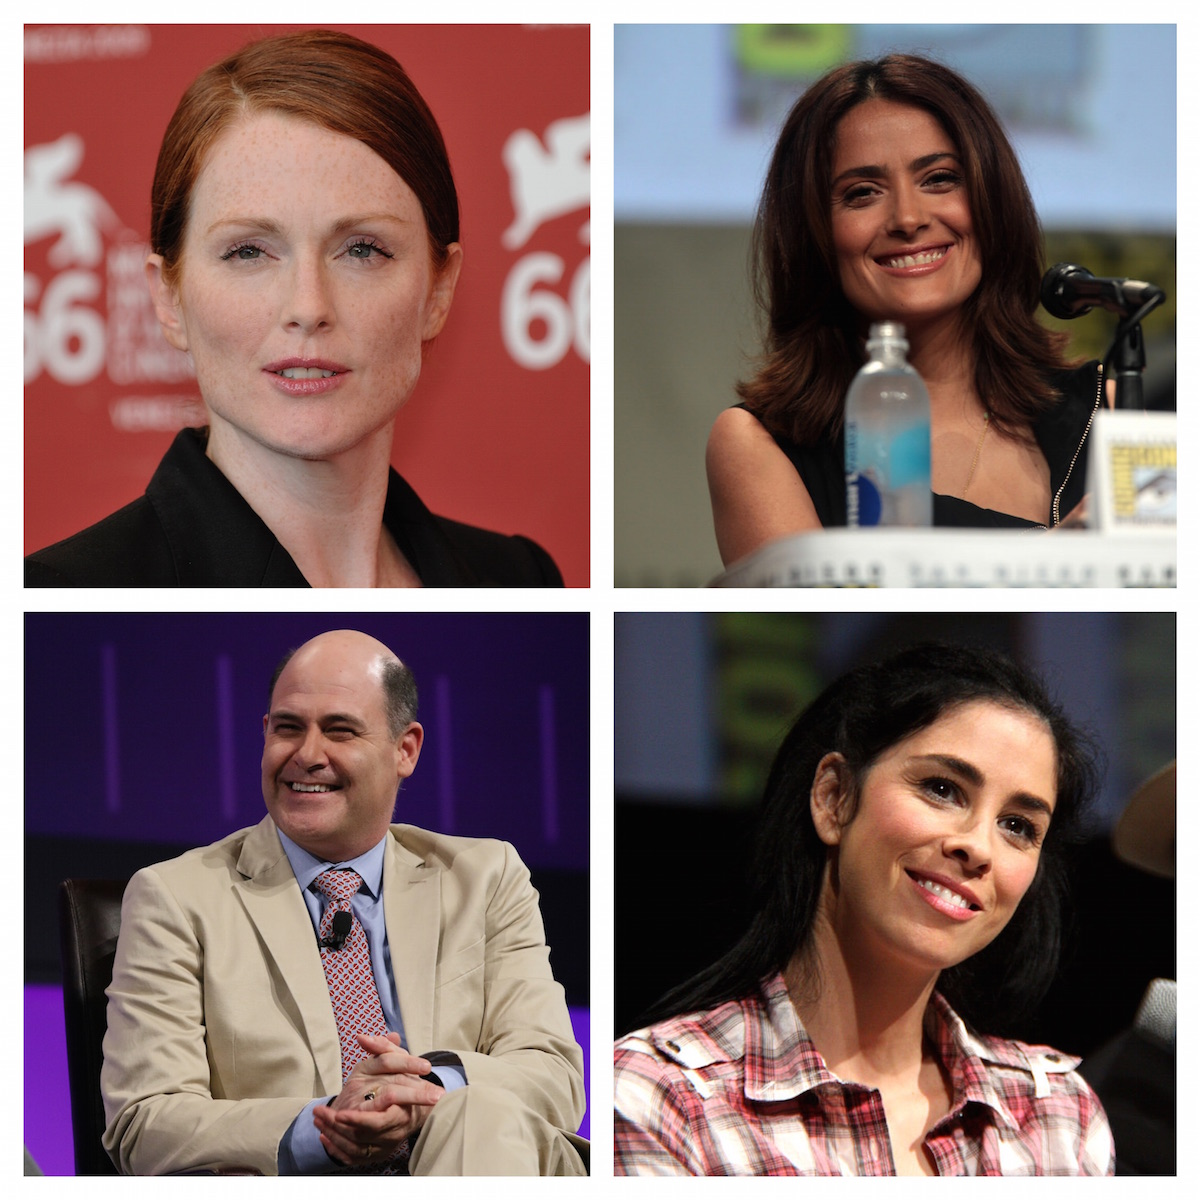 2015 Toronto International Film Festival In Conversation With … Lineup to Feature Julianne Moore, Salma Hayek, Sarah Silverman, and Matthew Weiner